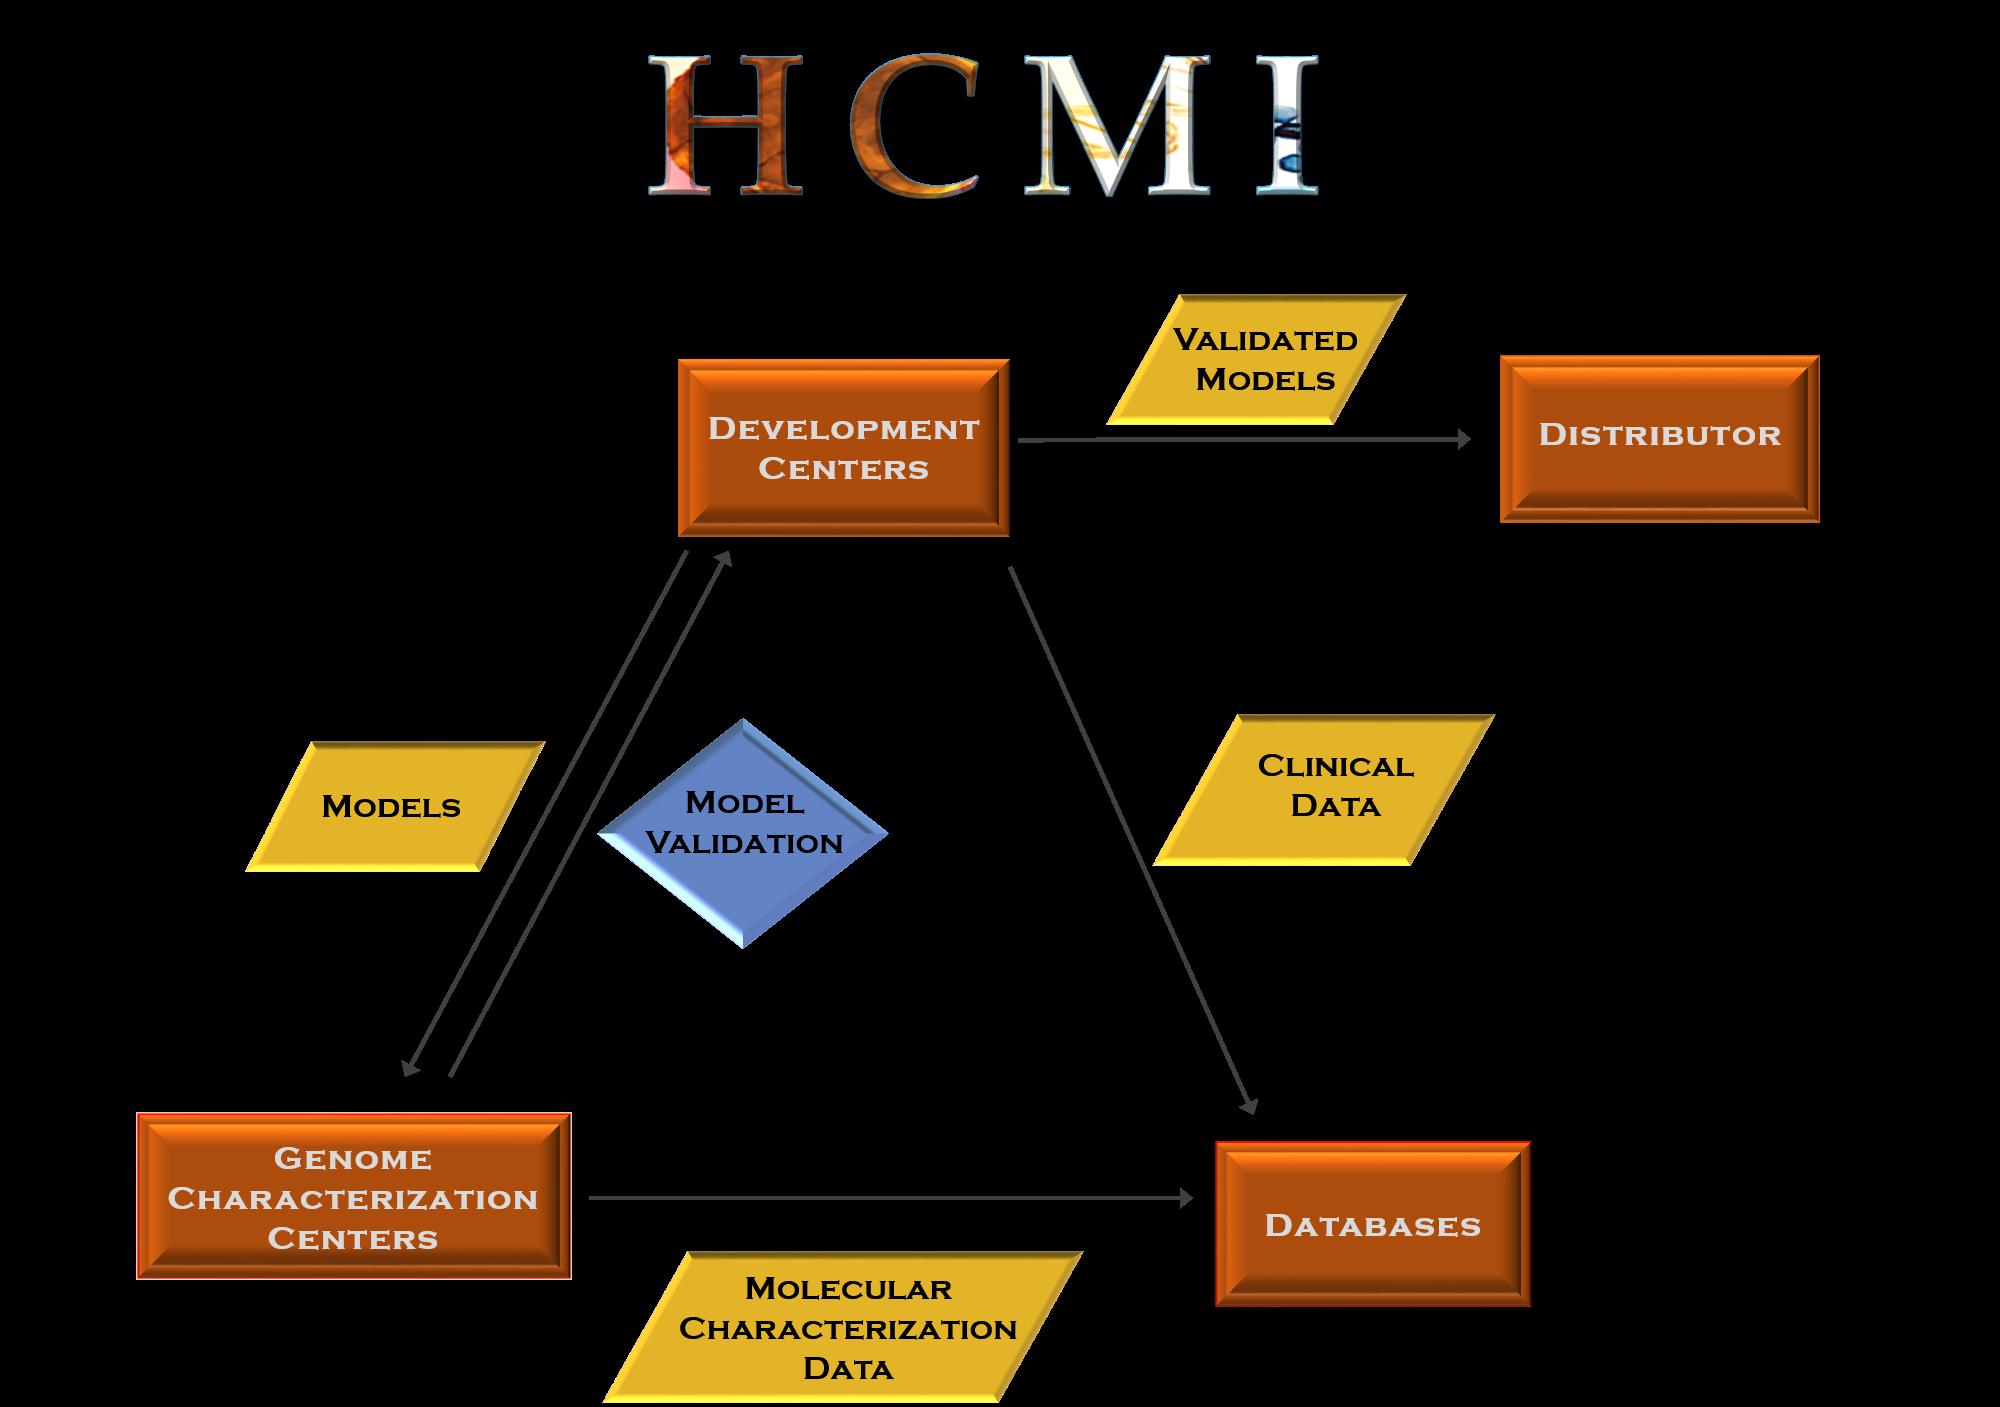 HCMI Model Processing